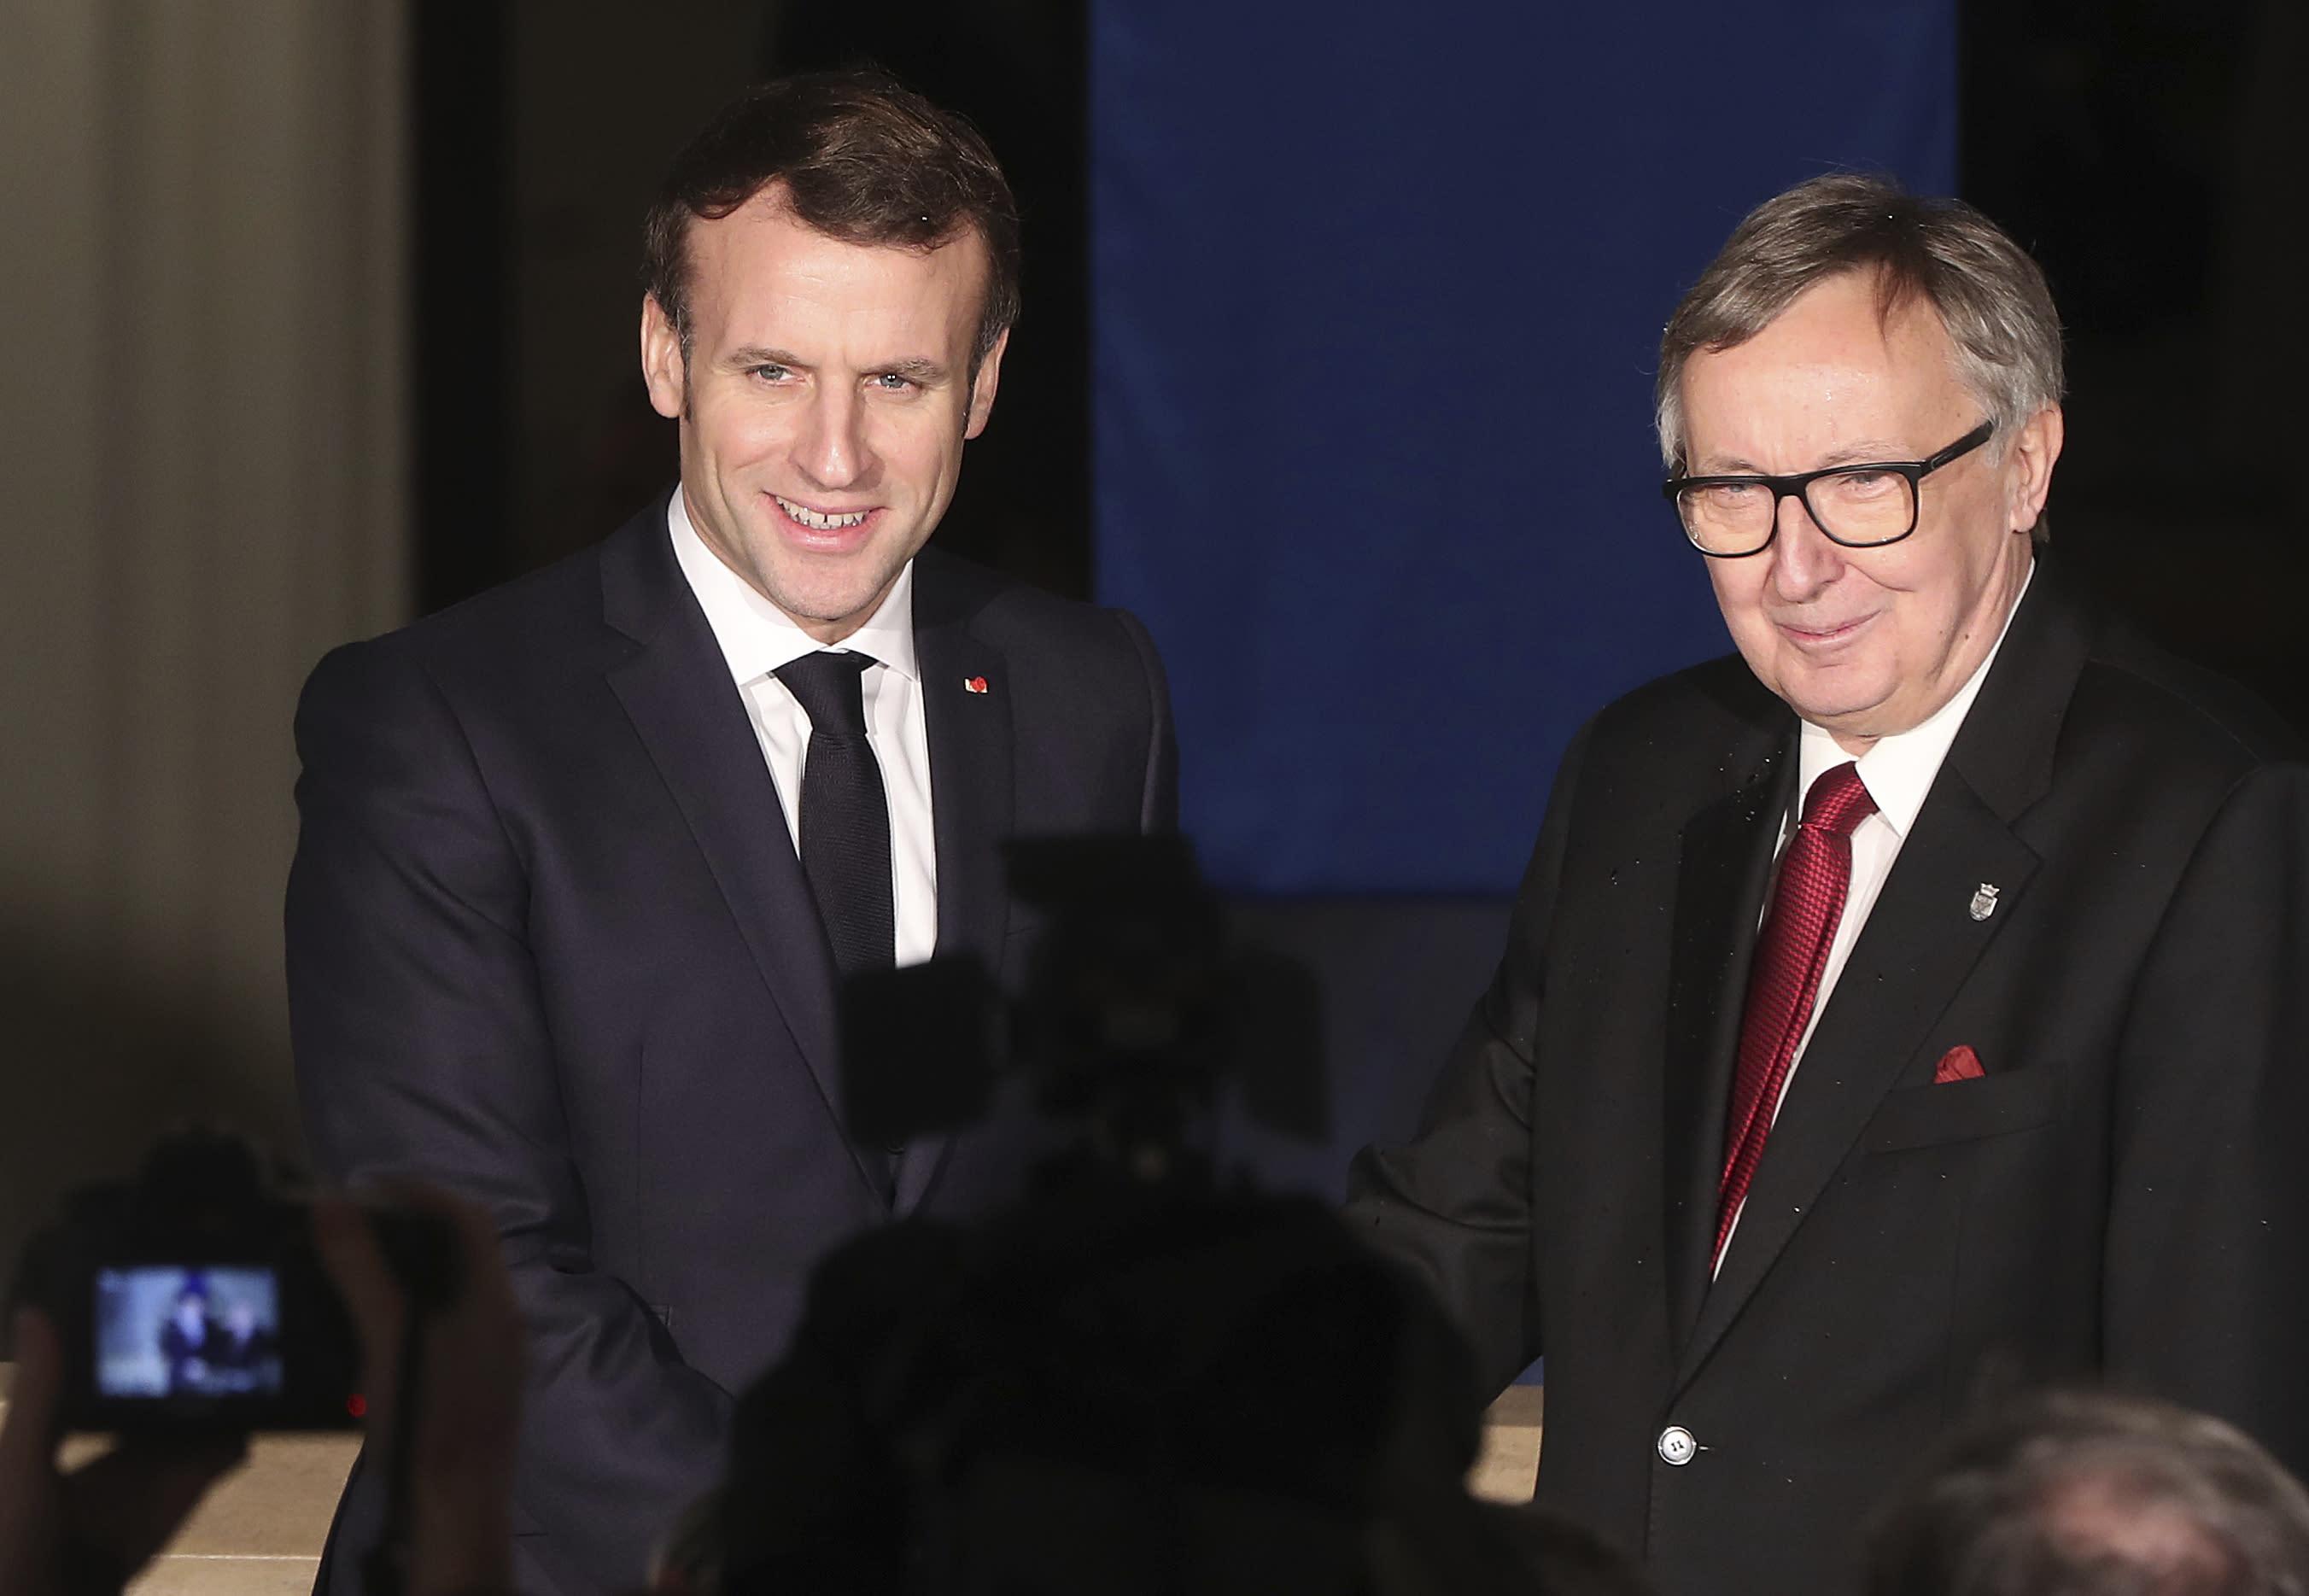 French President Emmanuel Macron, left, shakes hands with the rector of Jagellonne University, Wojciech Nowak, before giving a speech in Krakow, Poland, Tuesday, Feb. 4, 2020.(AP Photo/Czarek Sokolowski)